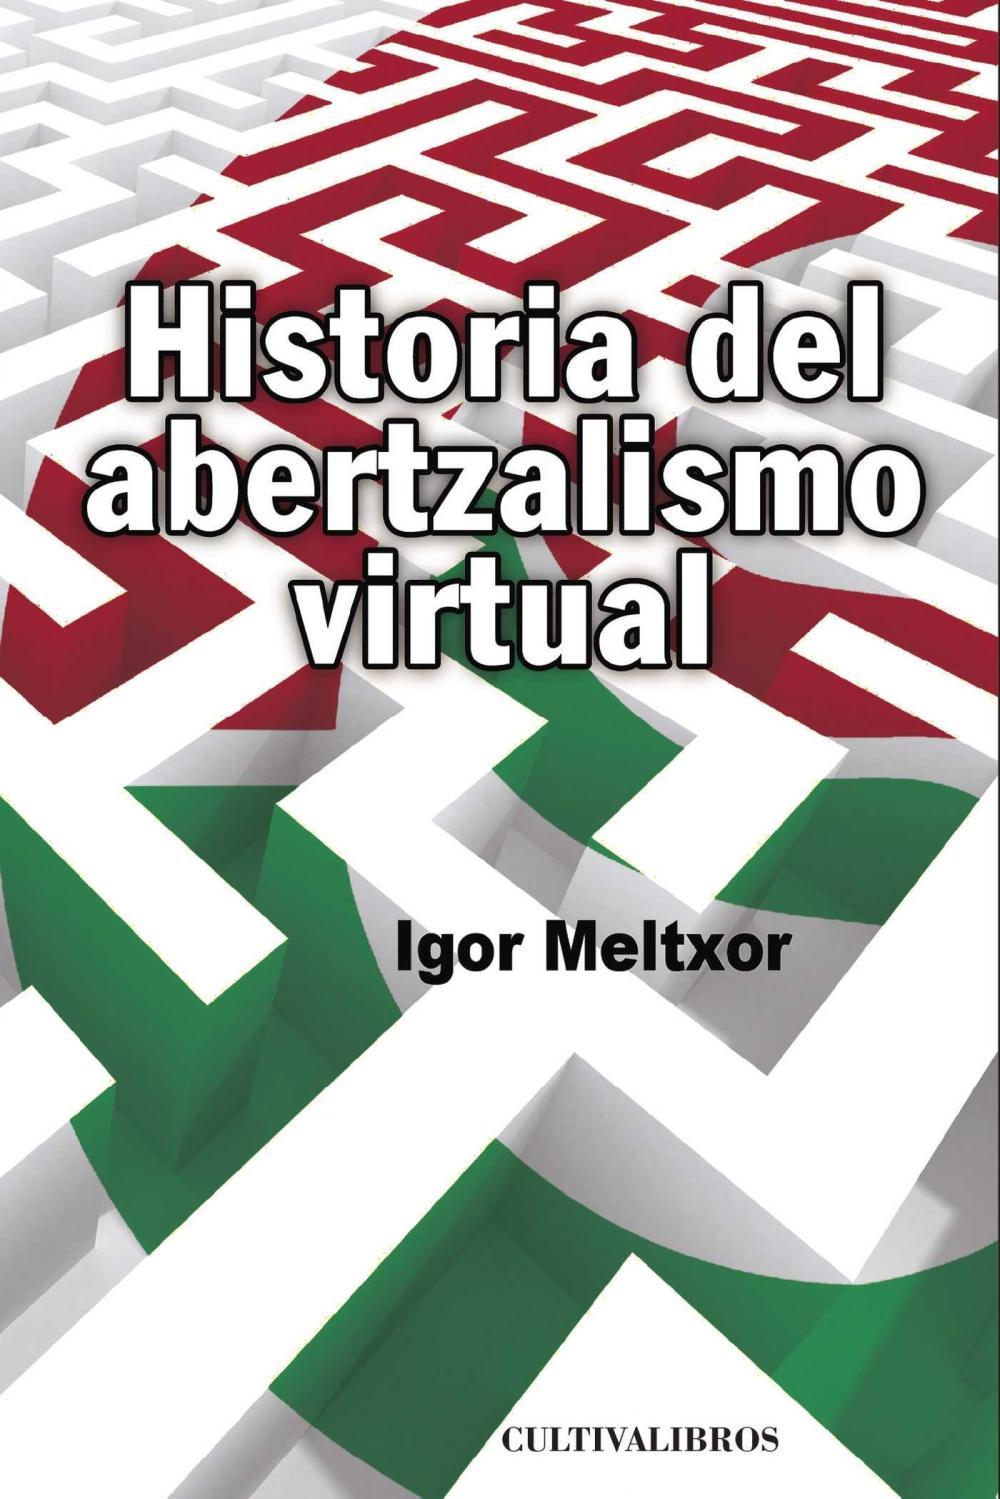 Historia del abertzalismo virtual